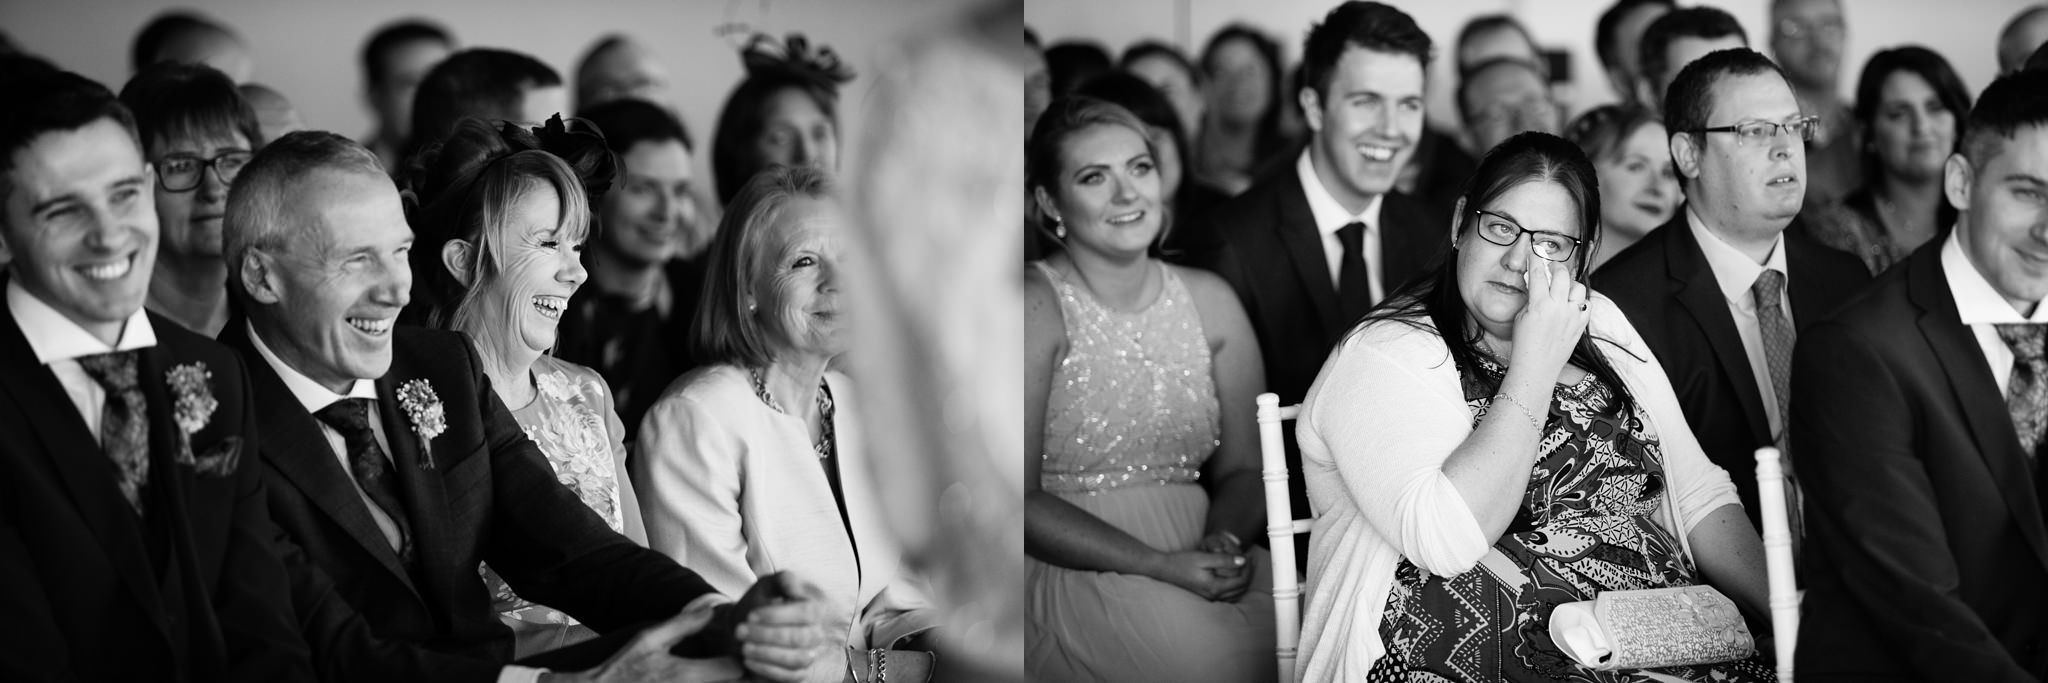 Elisha-Clarke-Photography-Dublin-City-Wedding_0073.jpg